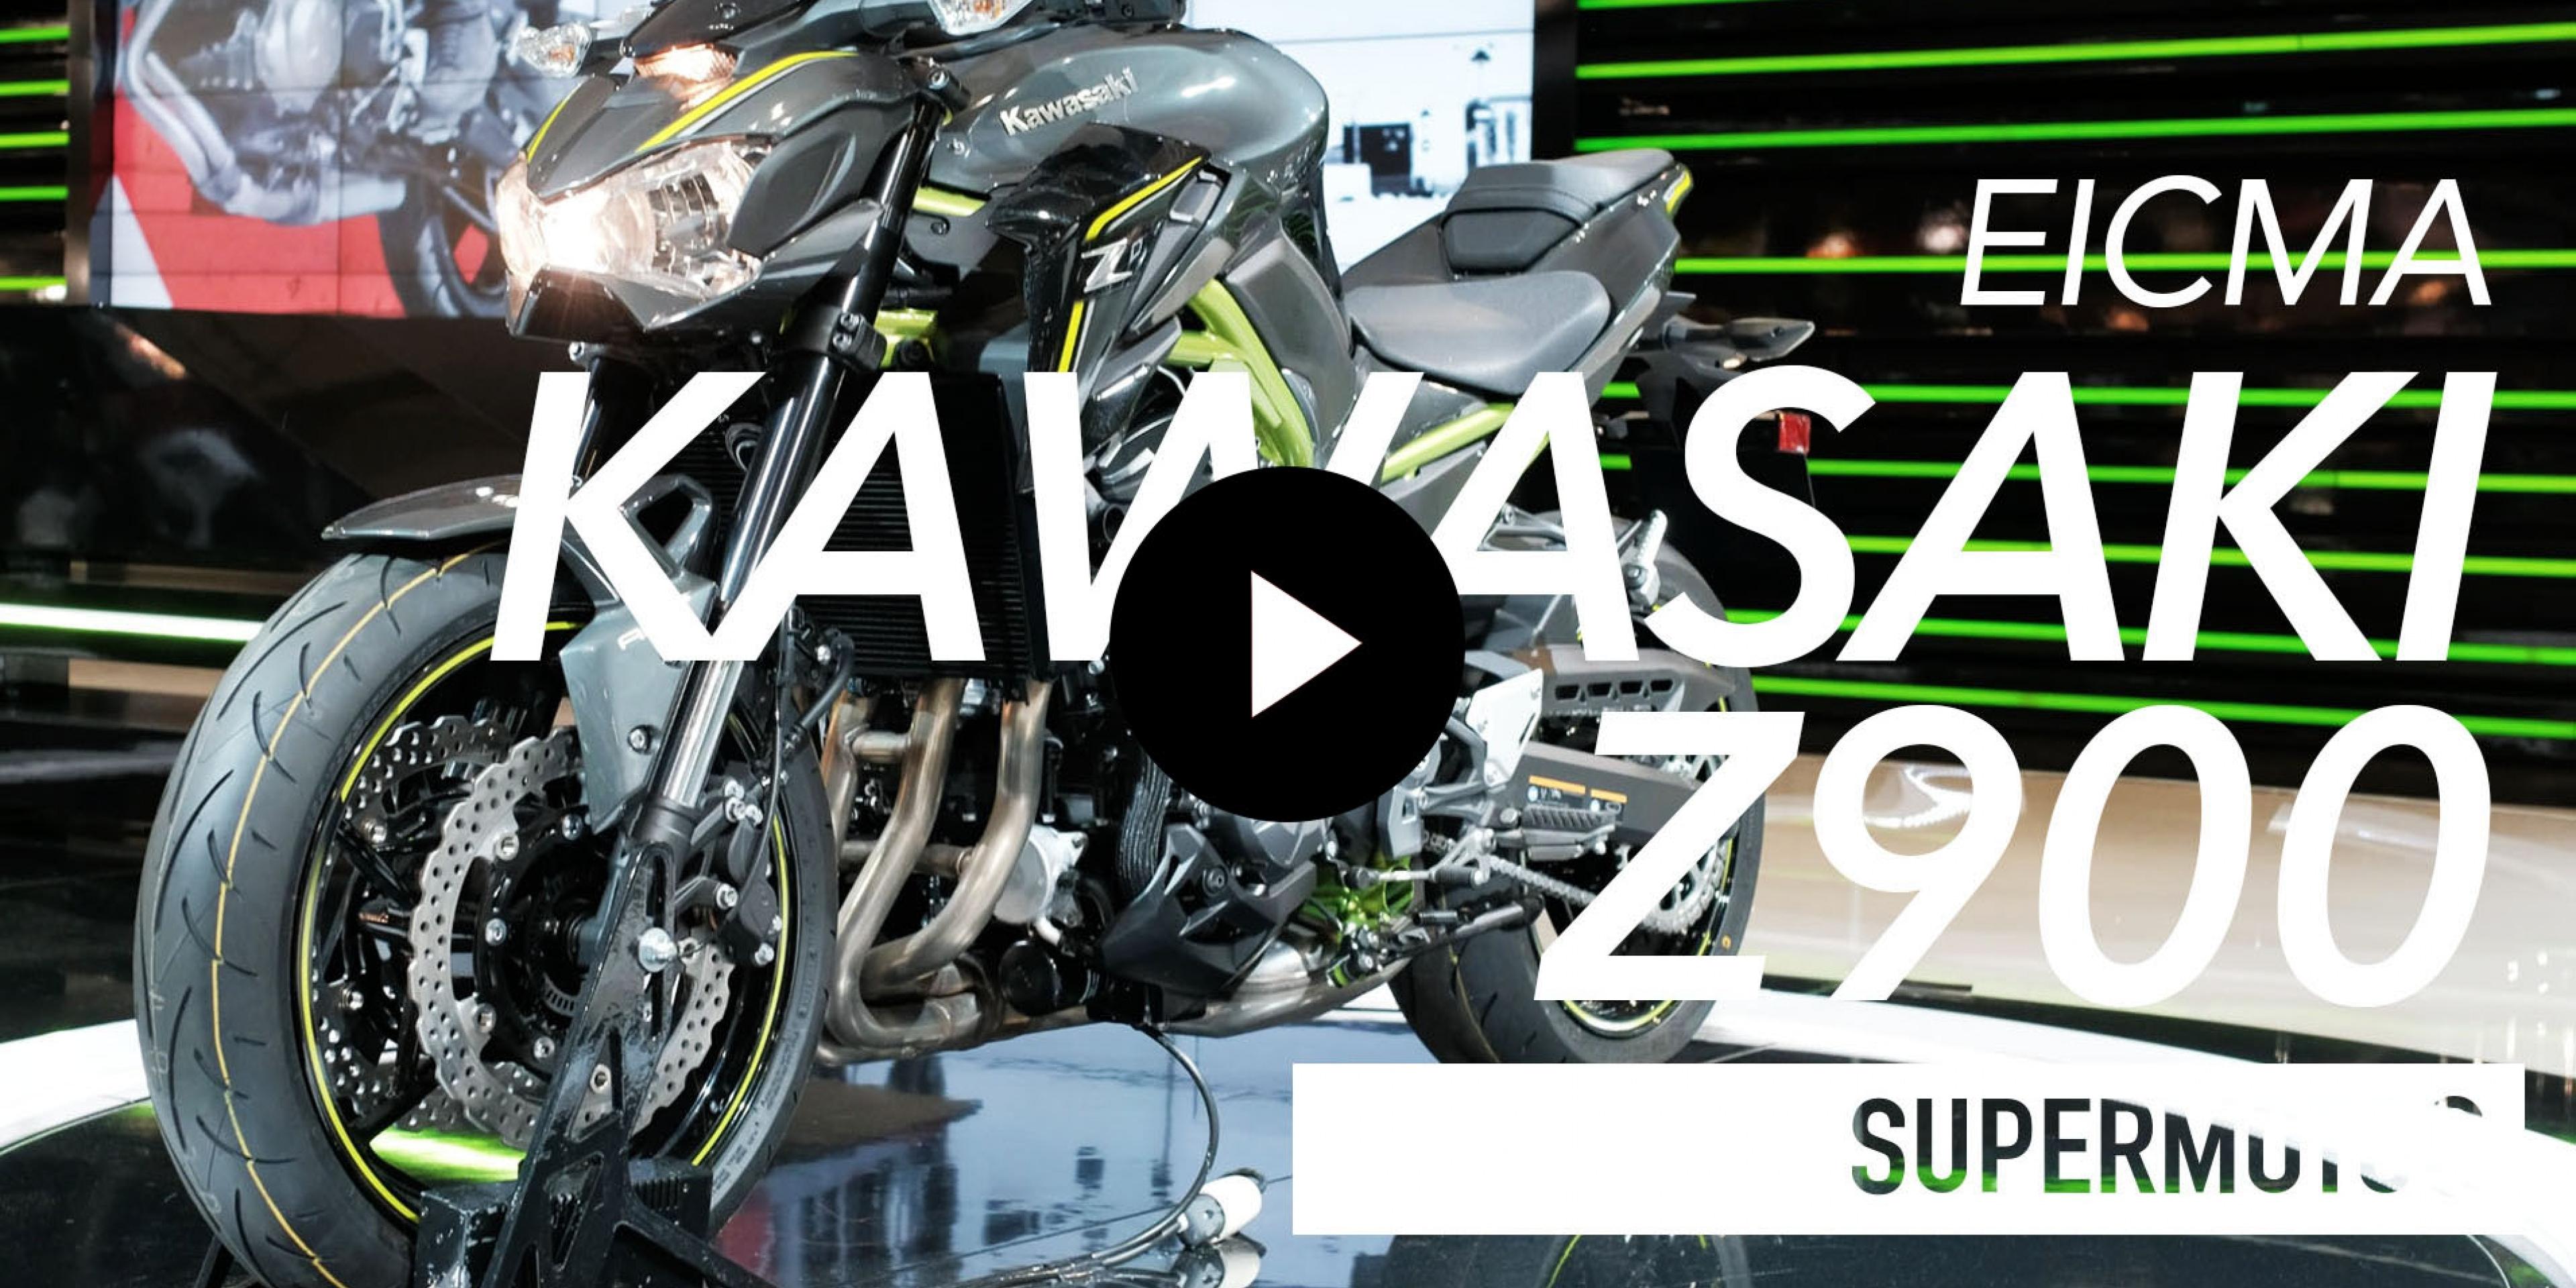 2017 KAWASAKI Z900 米蘭車展實拍